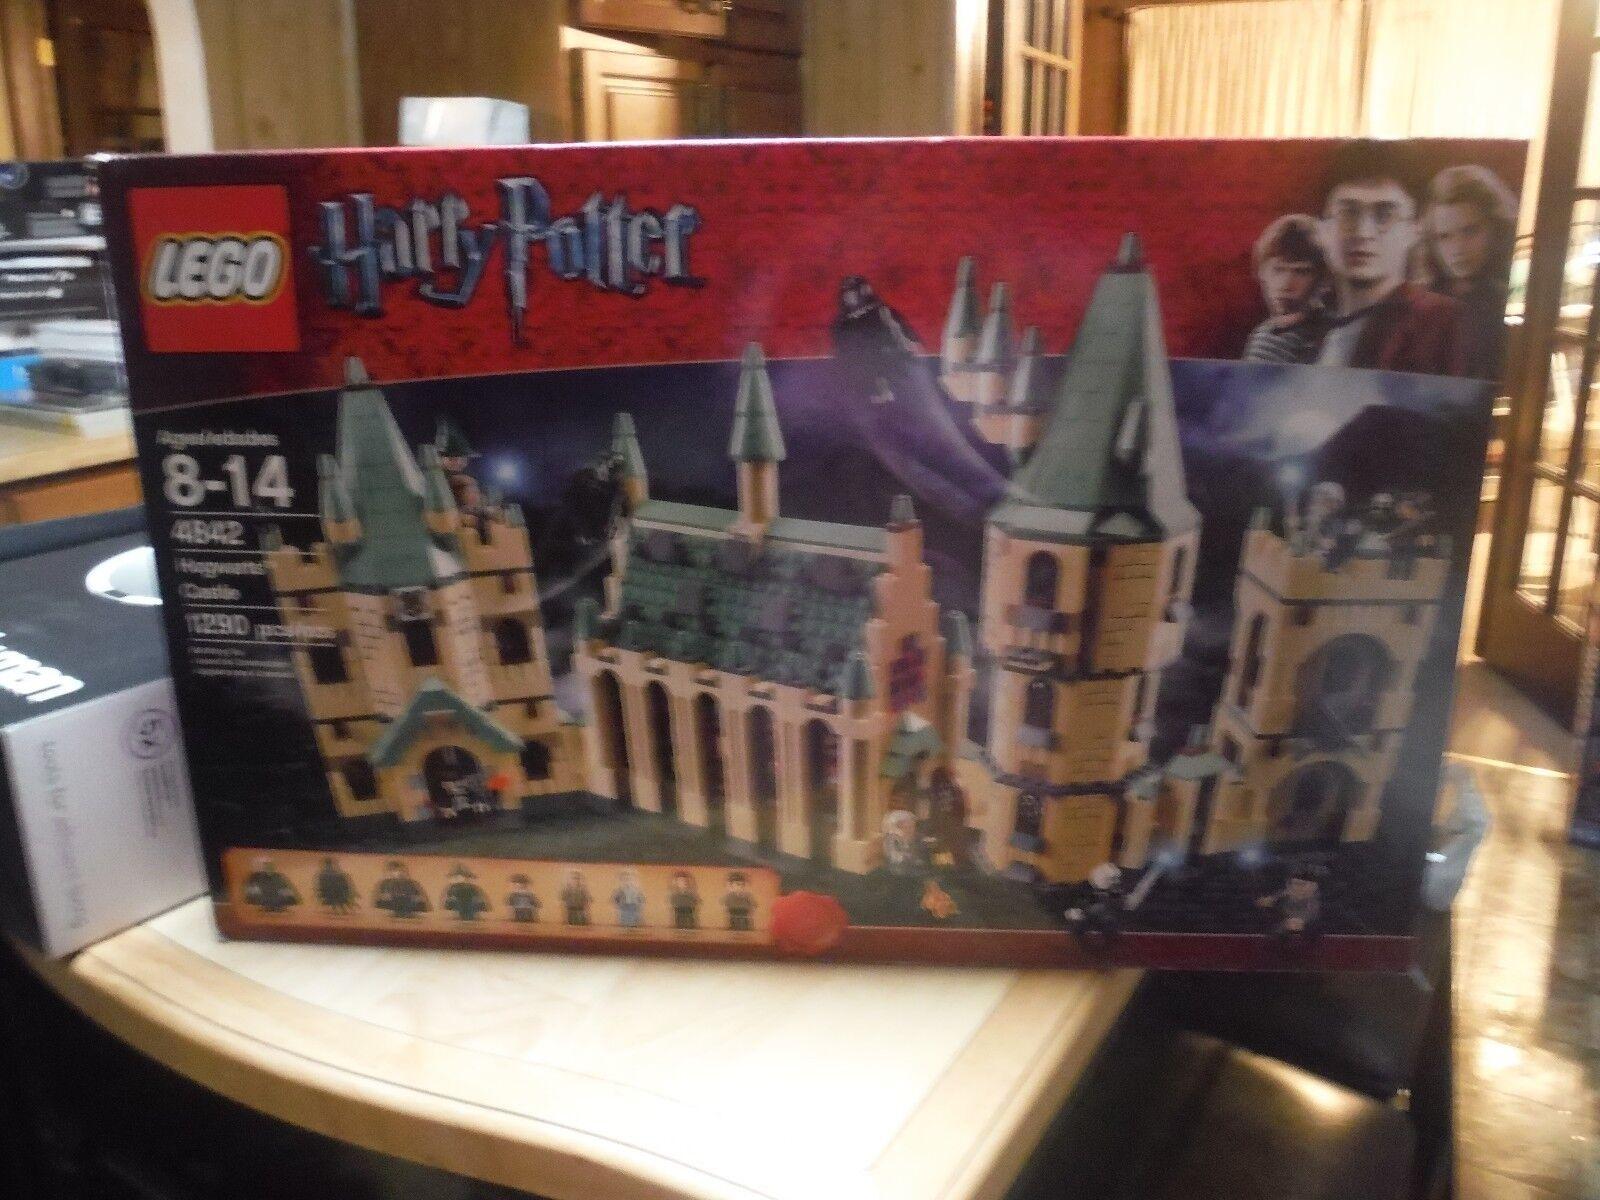 LEGO 4842 4842 4842 Harry Potter - Hogwarts Castle - New   d7ff1a